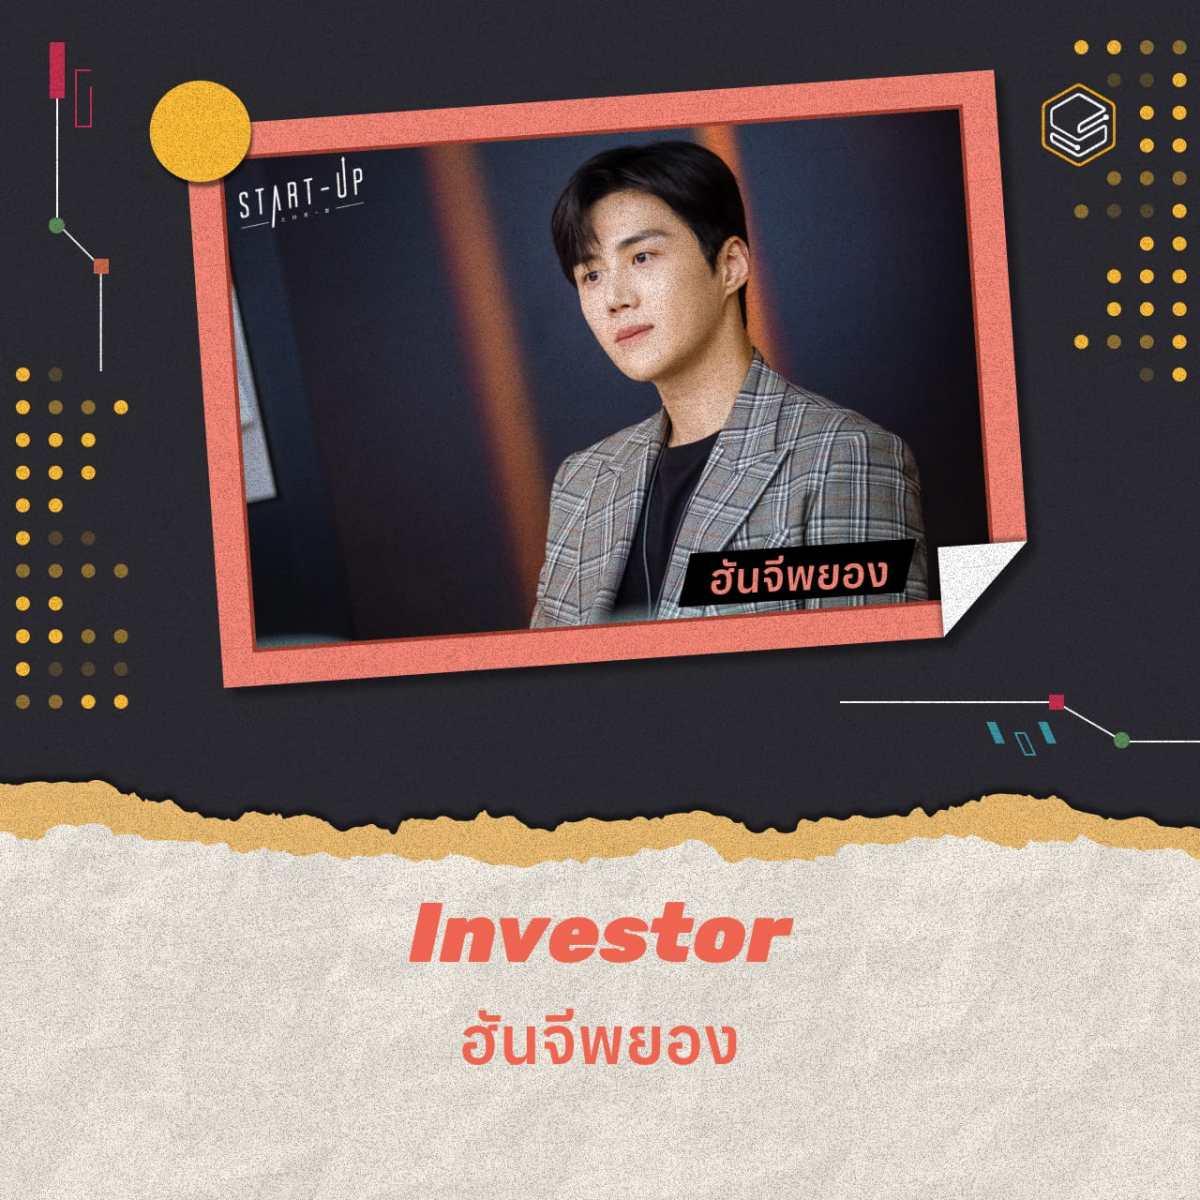 Investor | Skooldio Blog - เจาะลึกทักษะตัวละคร Start-up ที่คุณก็ทำได้